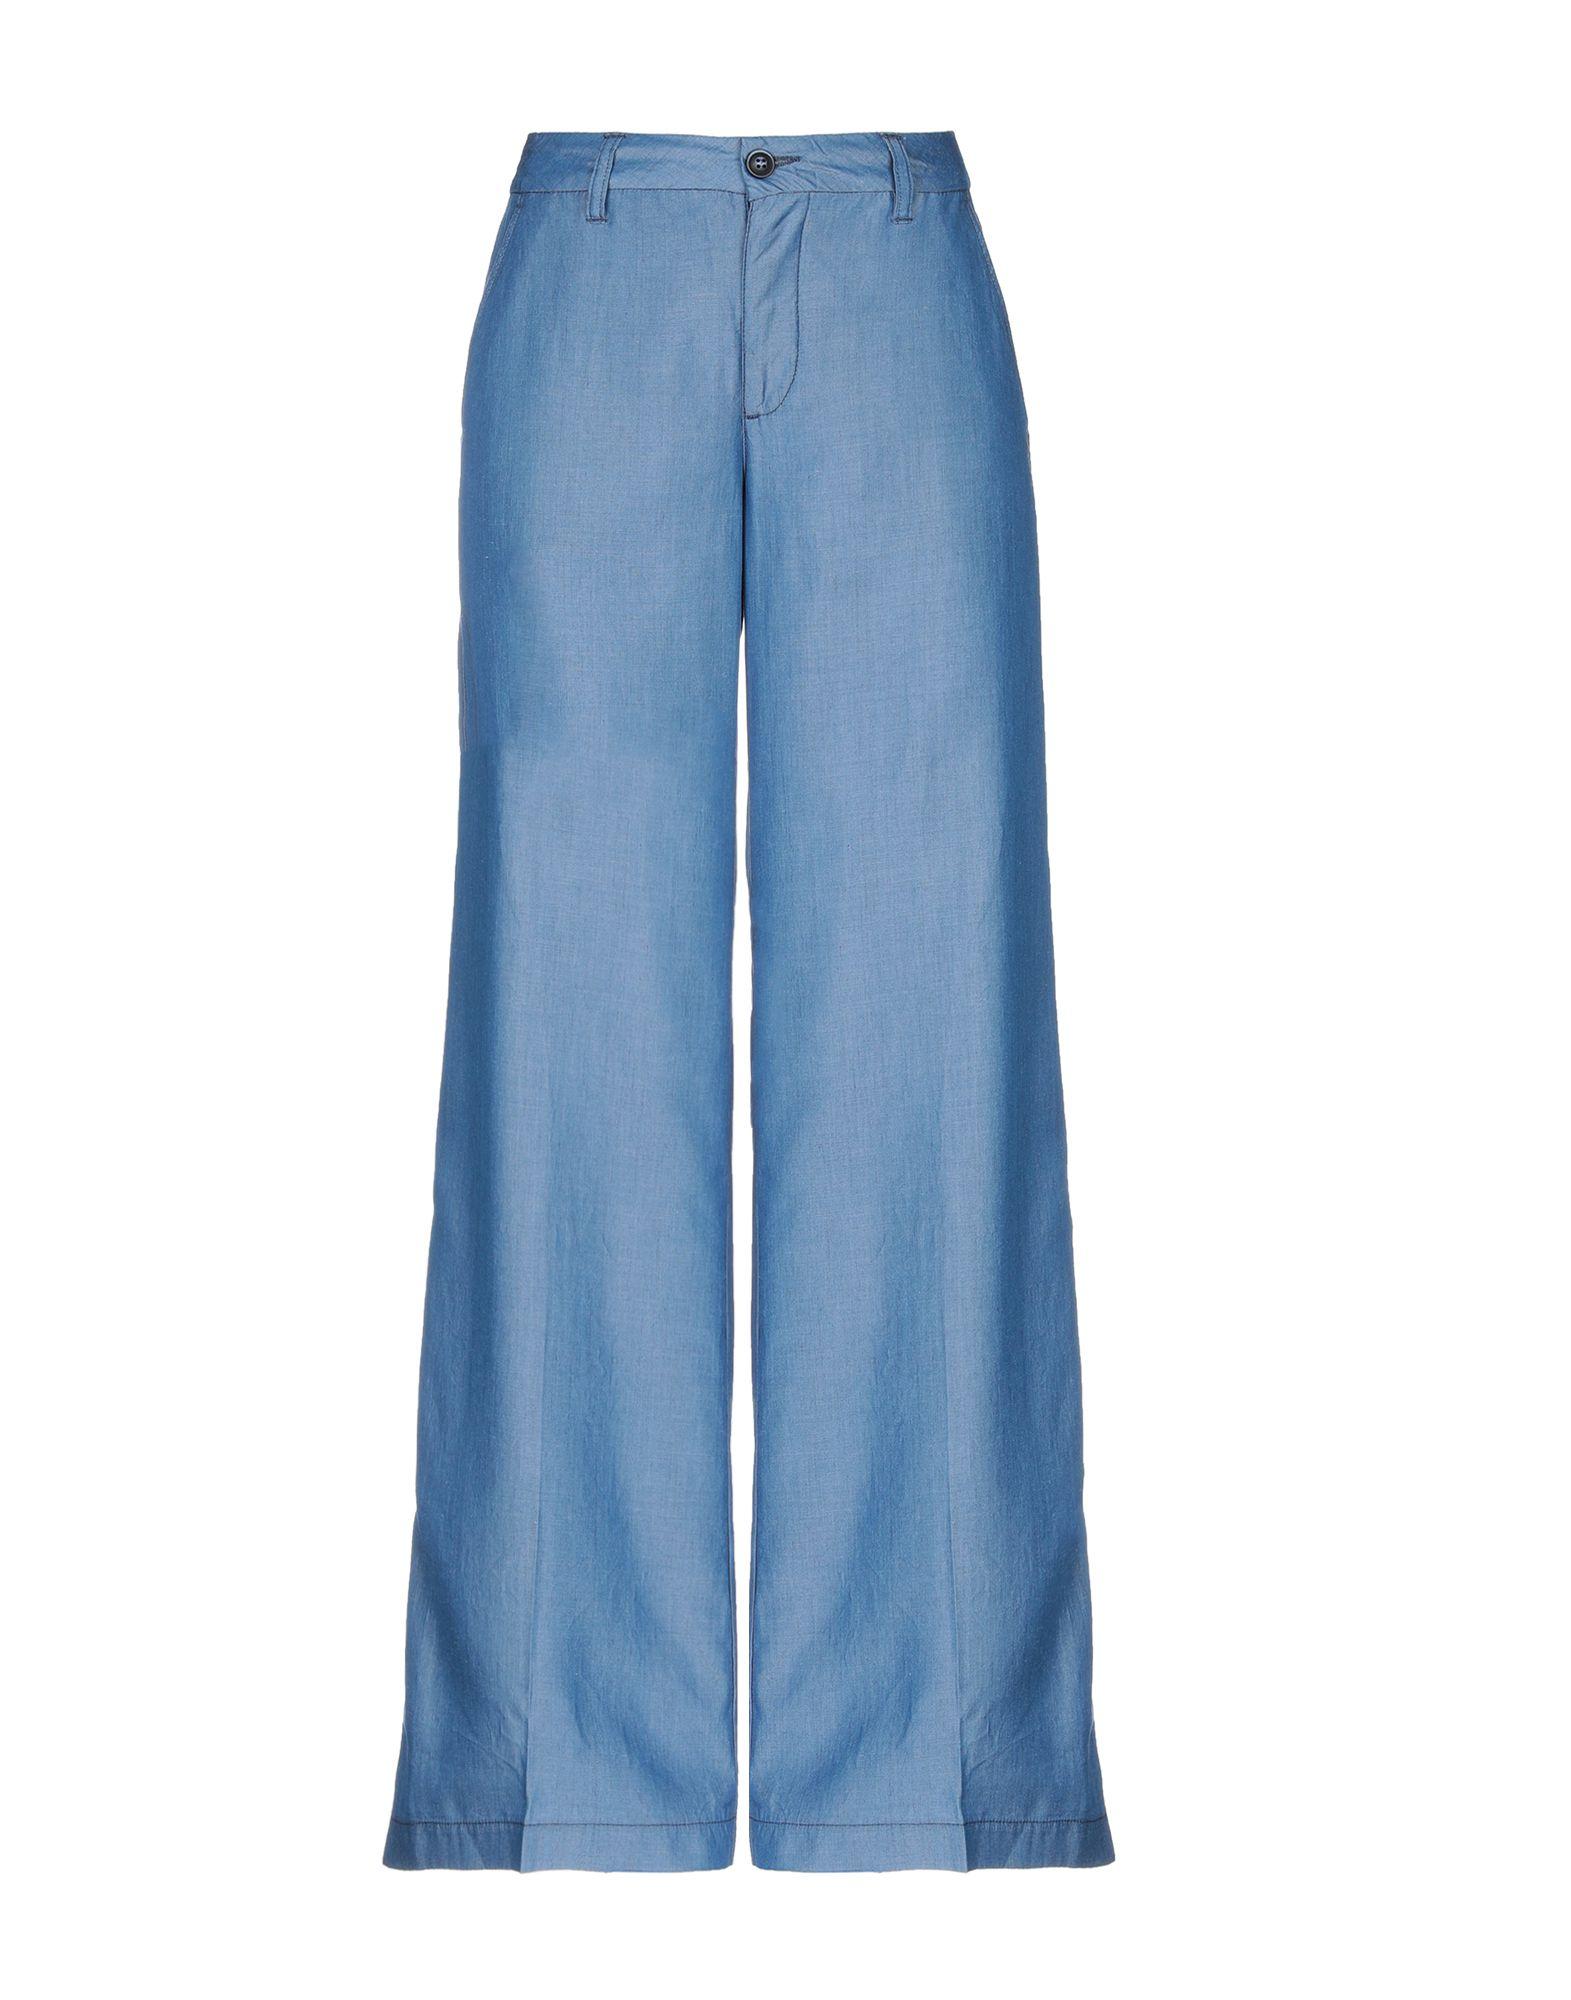 AVANTGAR DENIM by EUROPEAN CULTURE Джинсовые брюки цена 2017